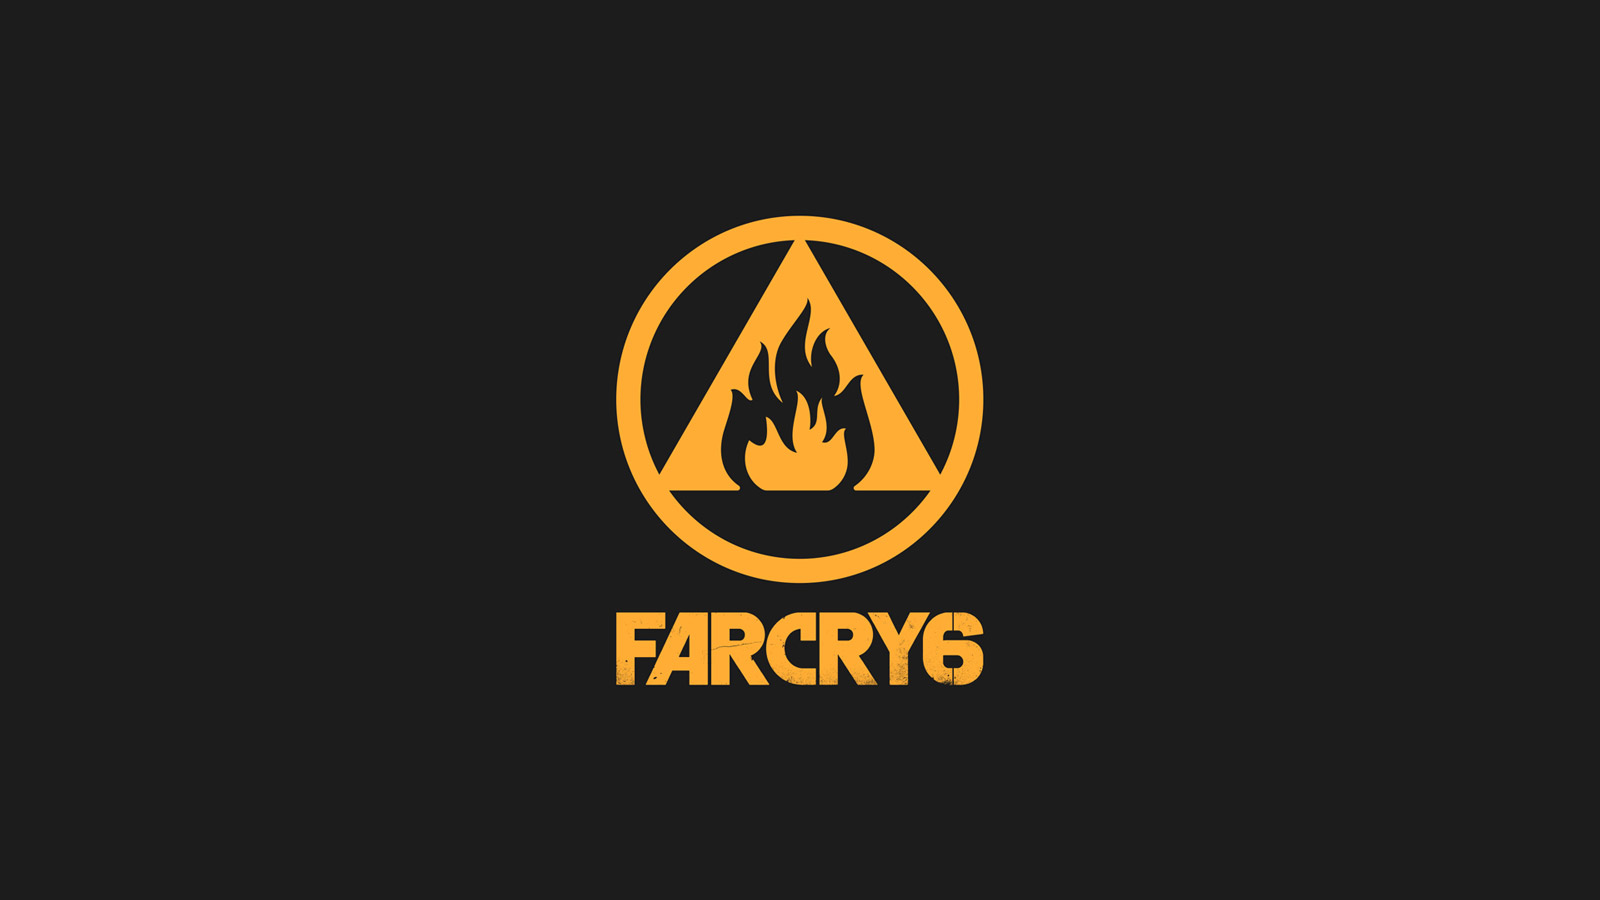 Far Cry 6 Wallpaper in 1600x900